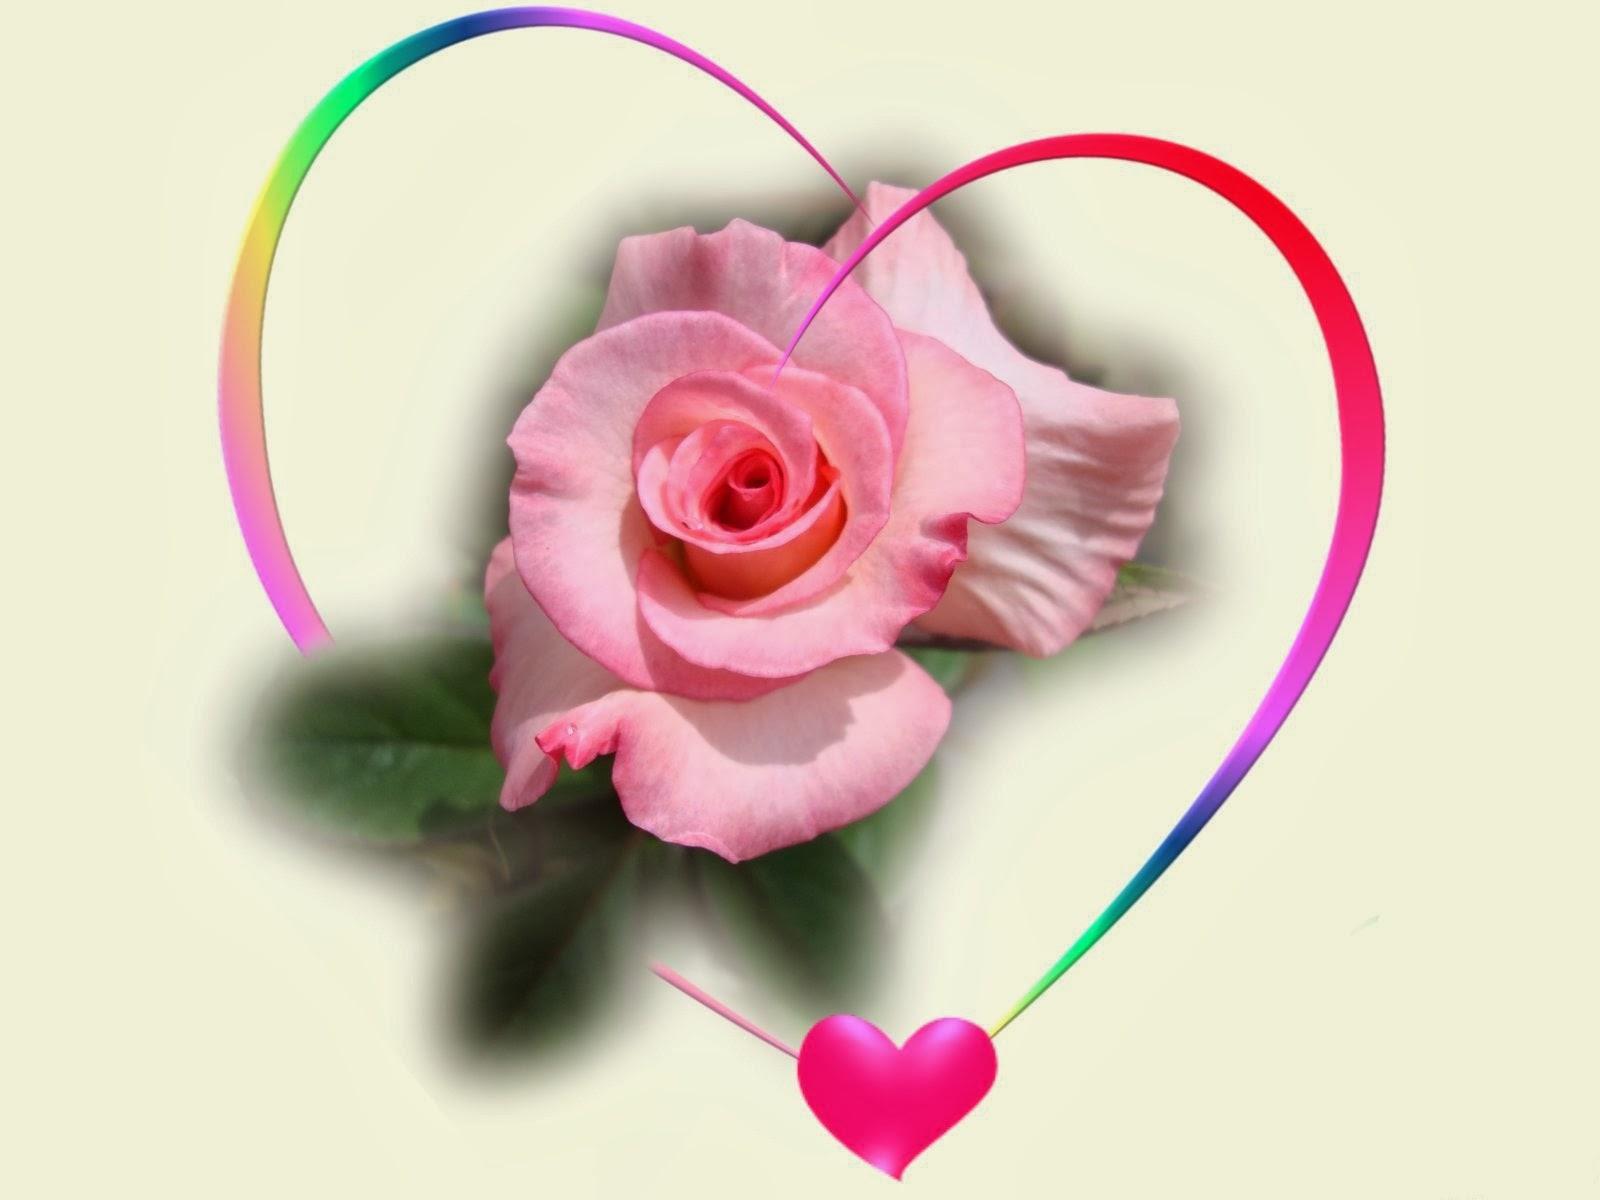 Pink rose hearts - Pink roses and hearts wallpaper ...